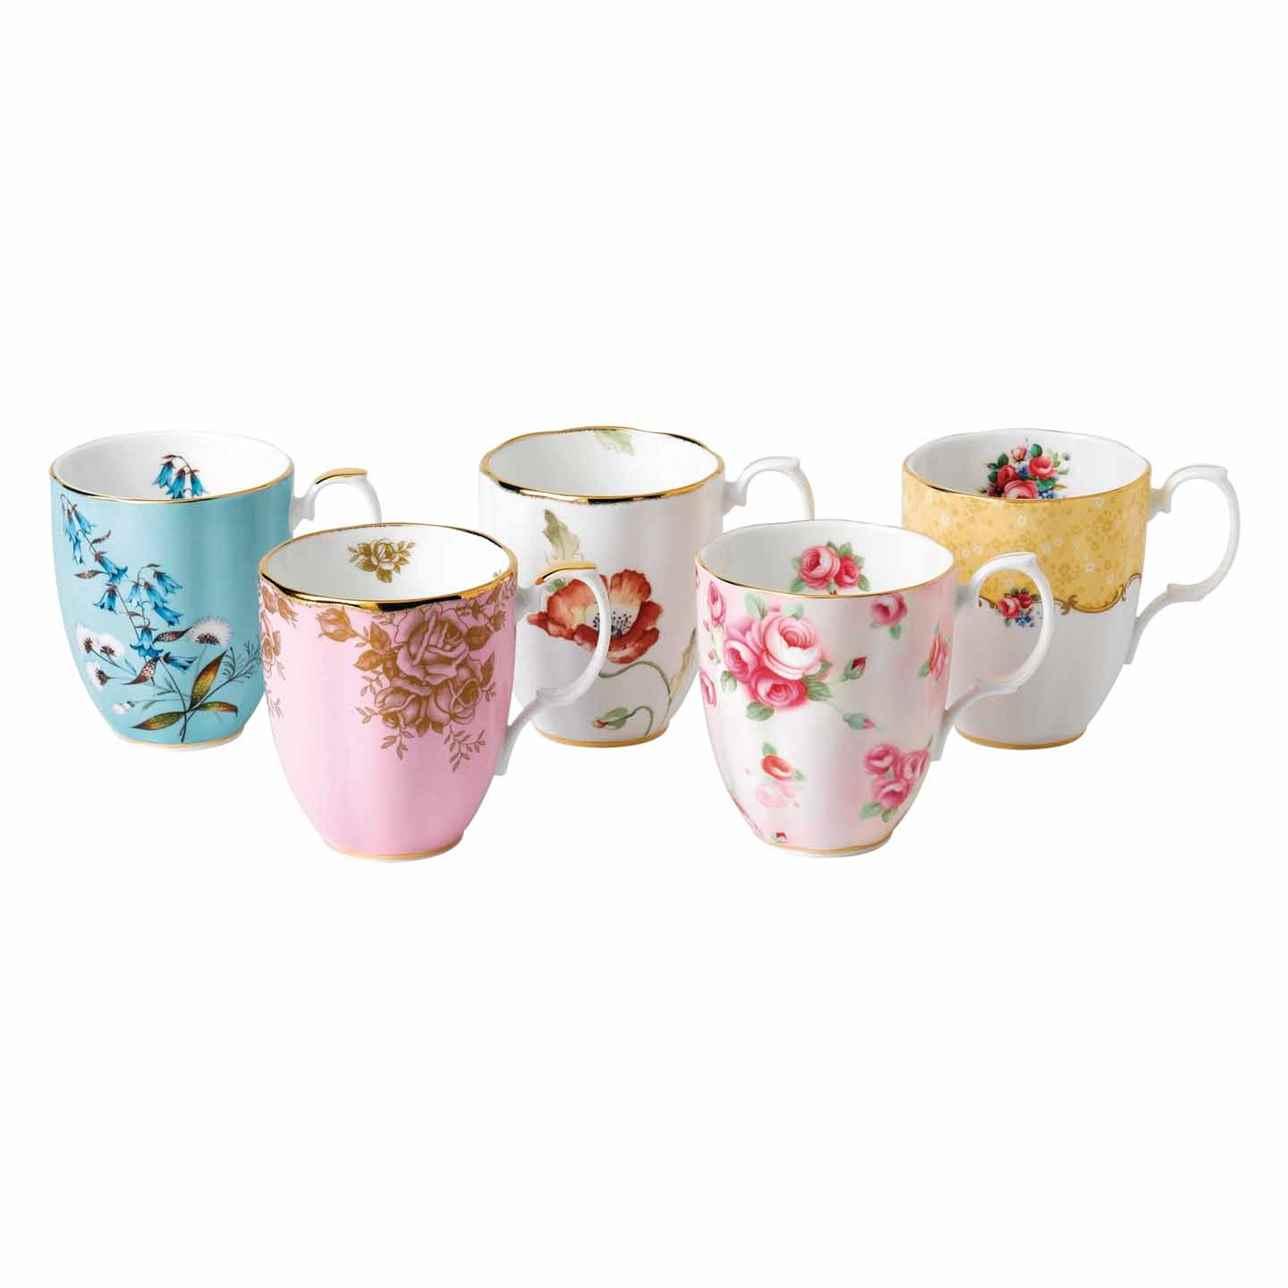 Royal Albert 100 Years of Royal Albert 5 Piece Mug Set (1950-1990)